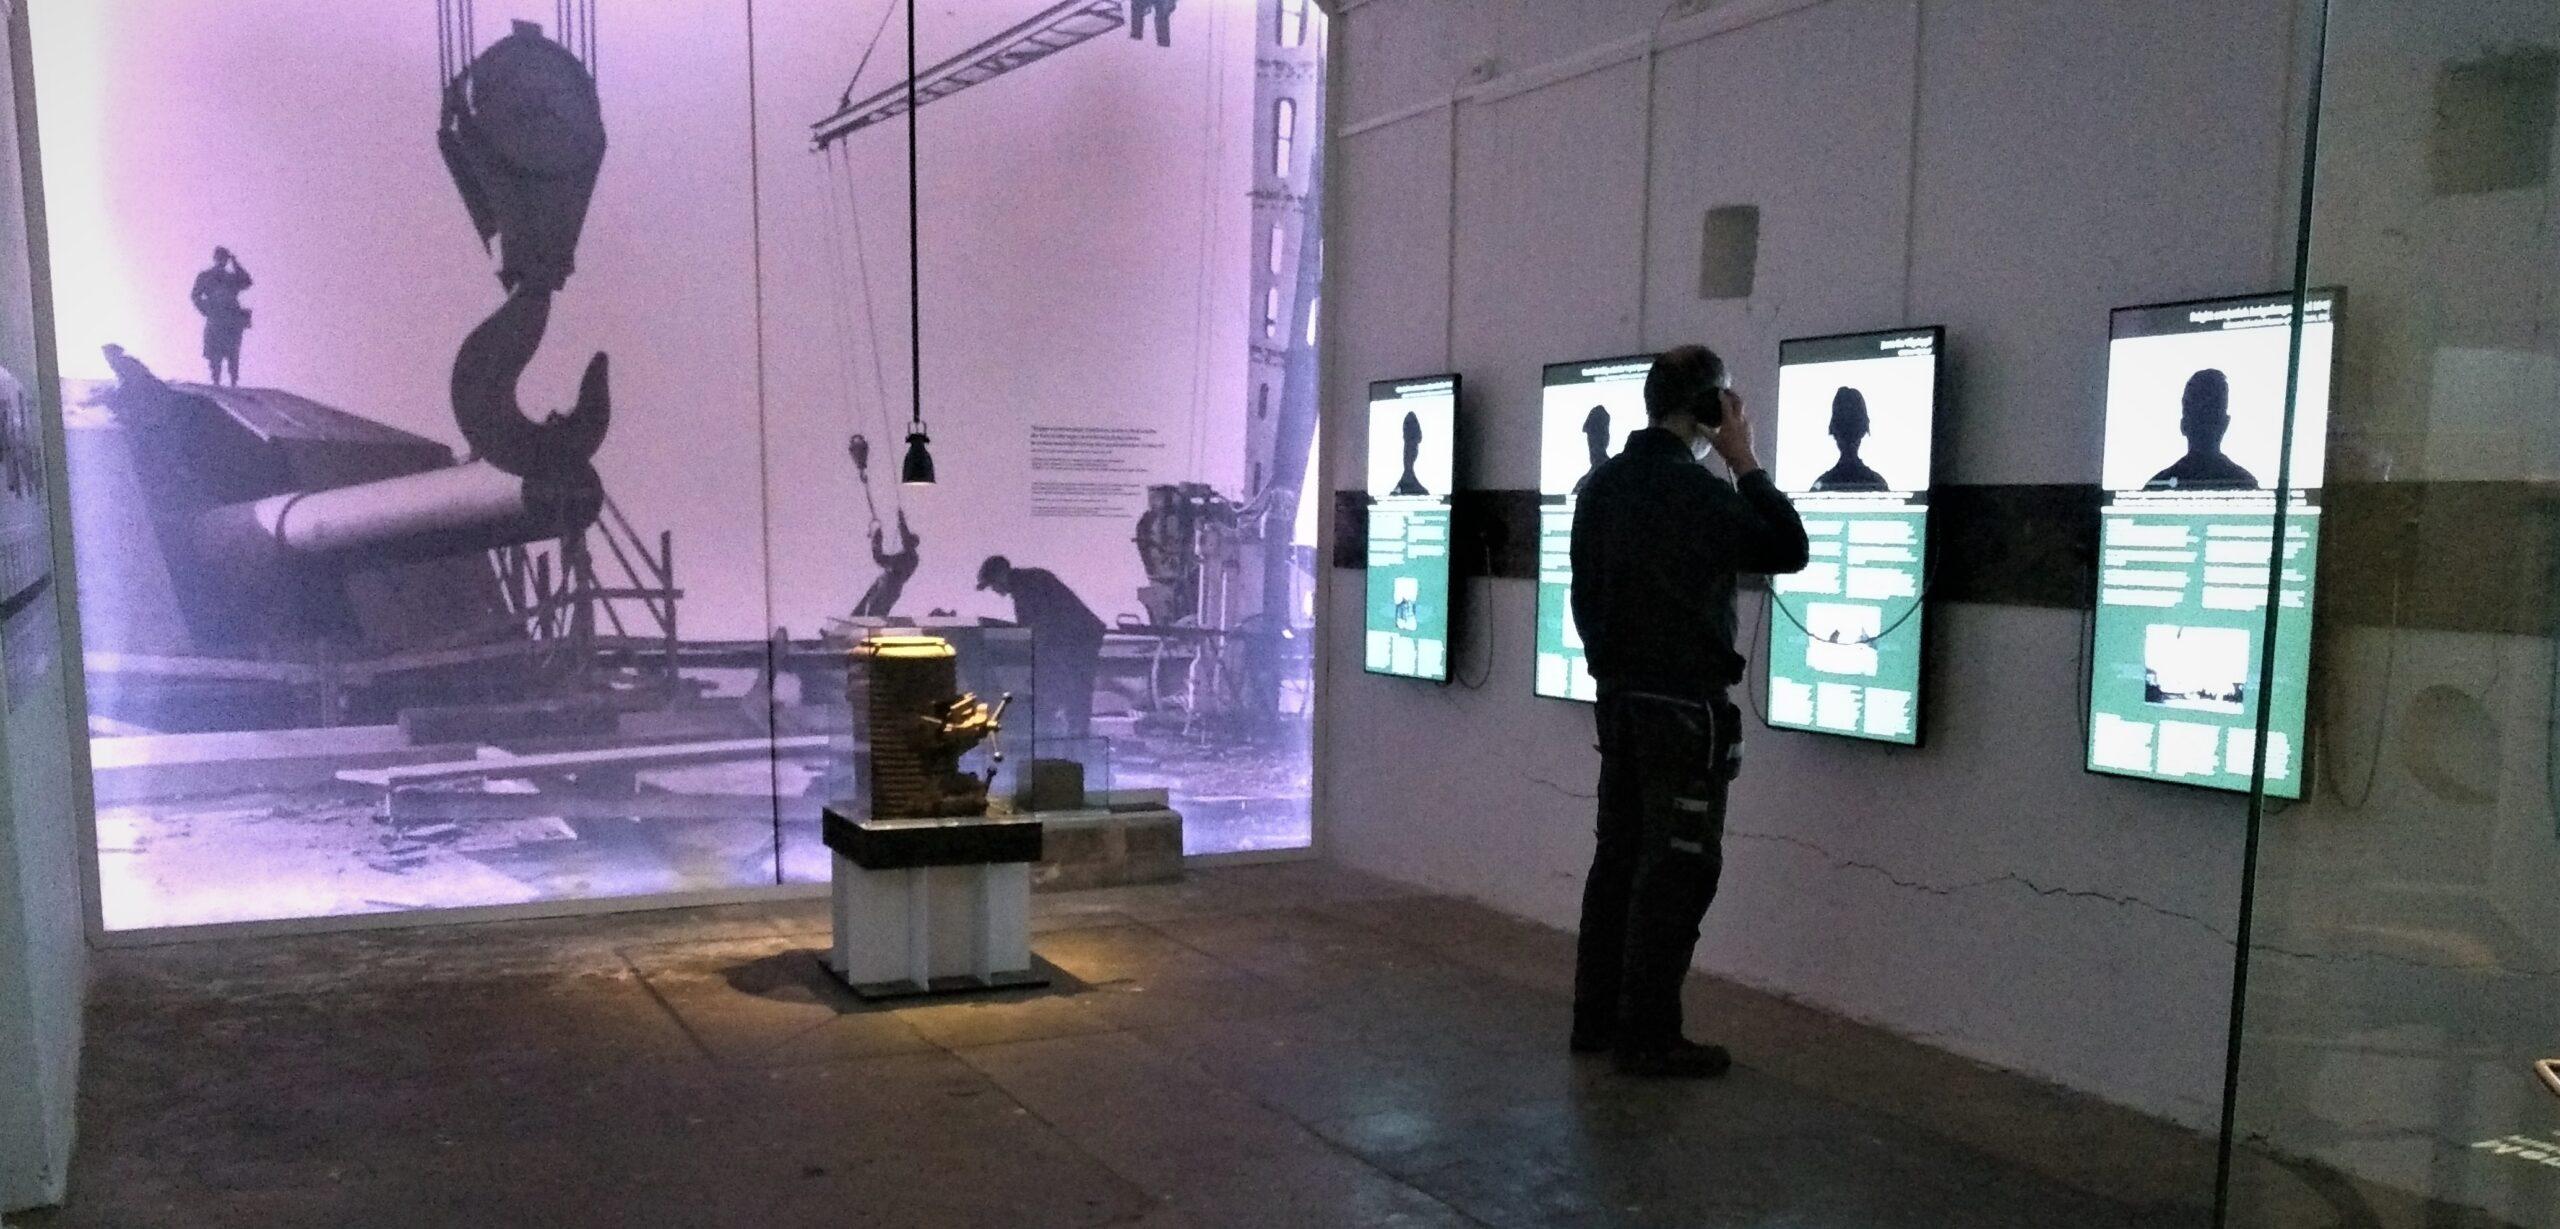 % Ny utstilling på Kristiansand kanonmuseum - Ny utstilling på Møvik